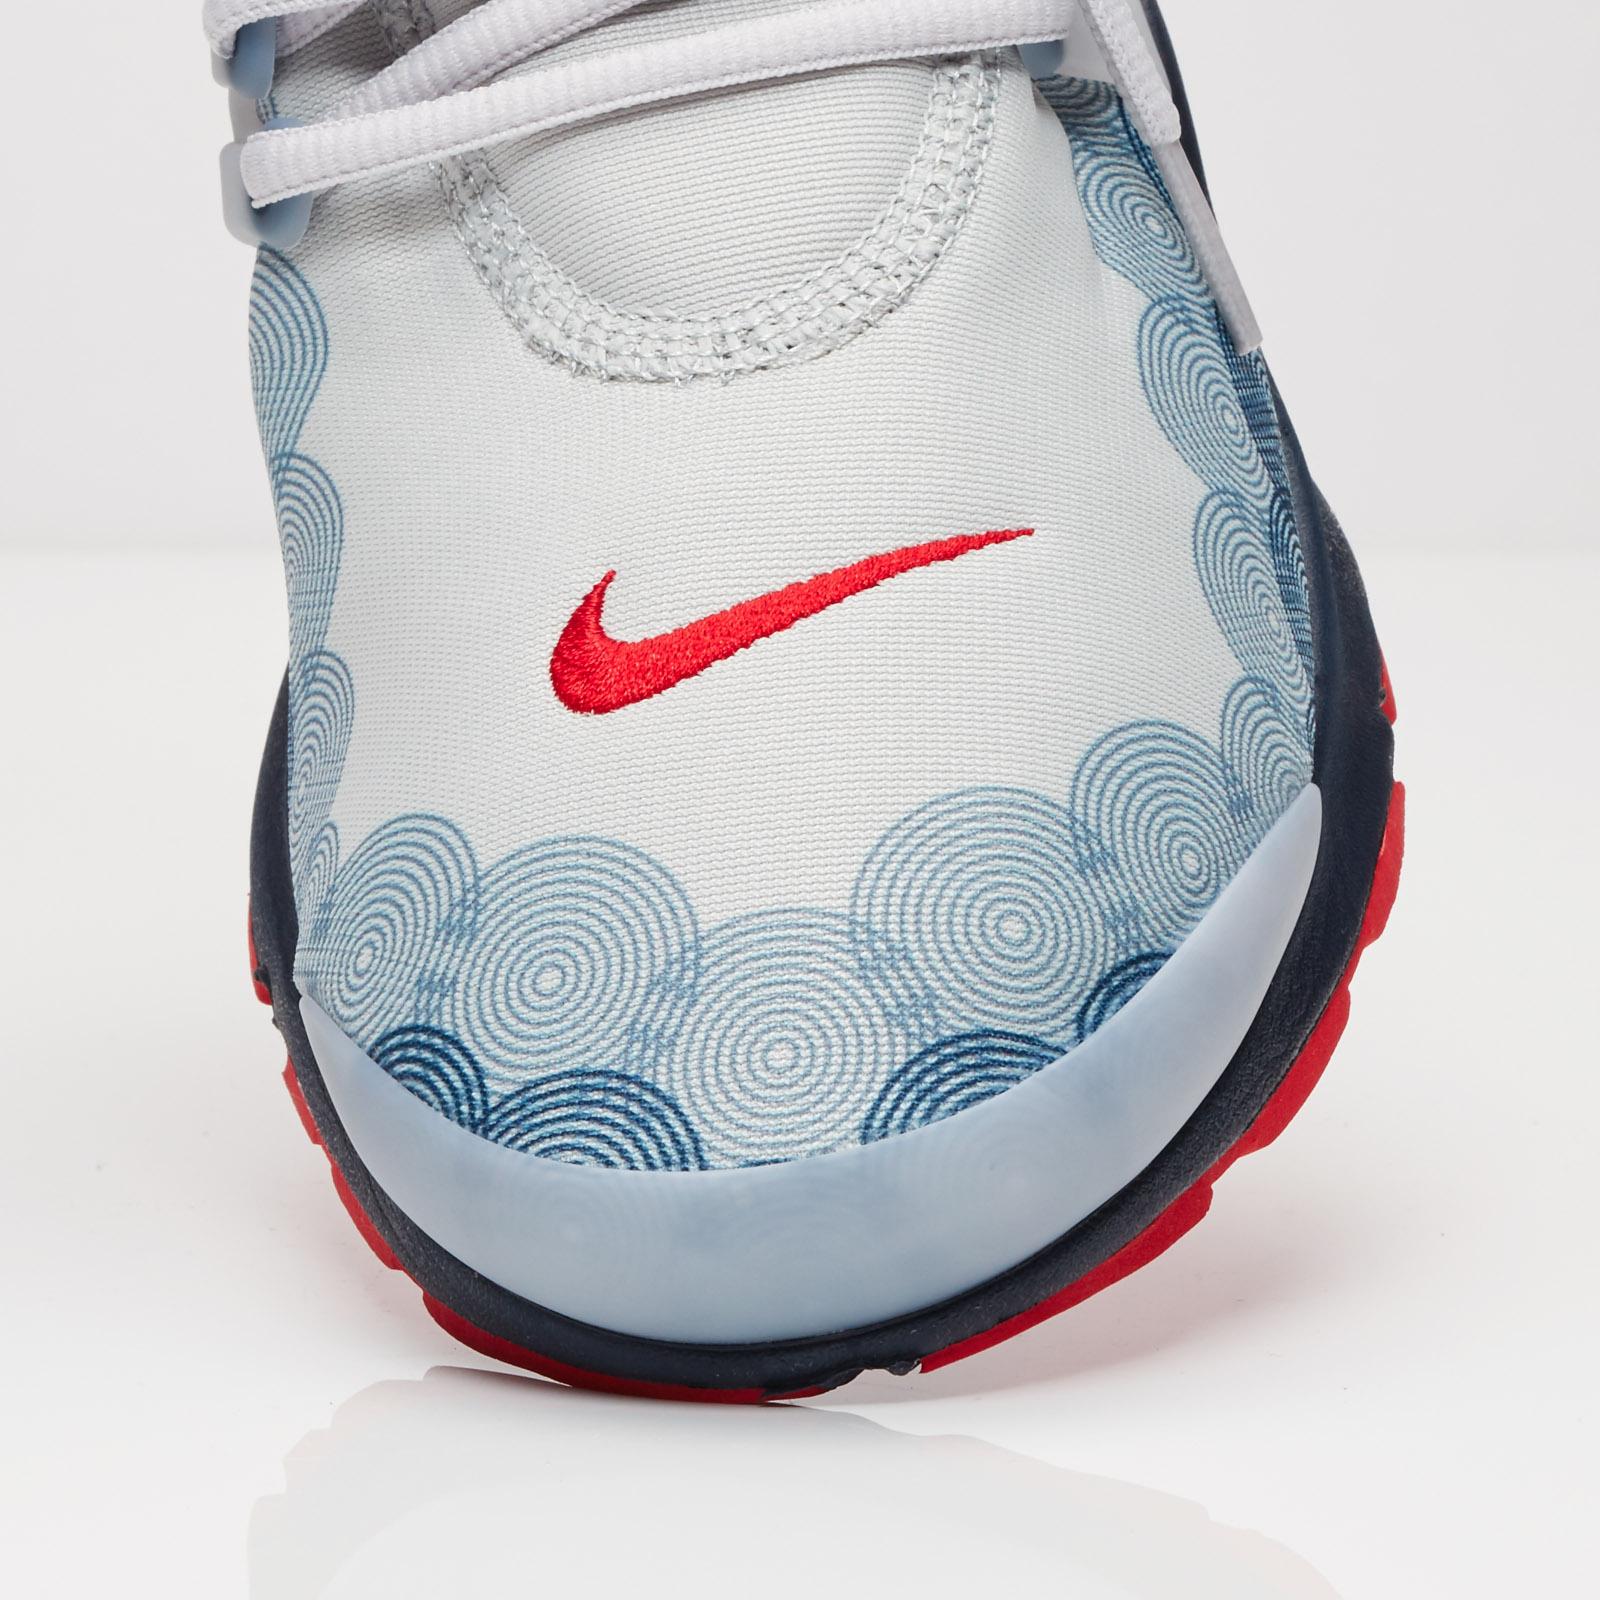 premium selection c8790 ba8de Nike Air Presto GPX - 848188-004 - Sneakersnstuff   sneakers   streetwear  online since 1999